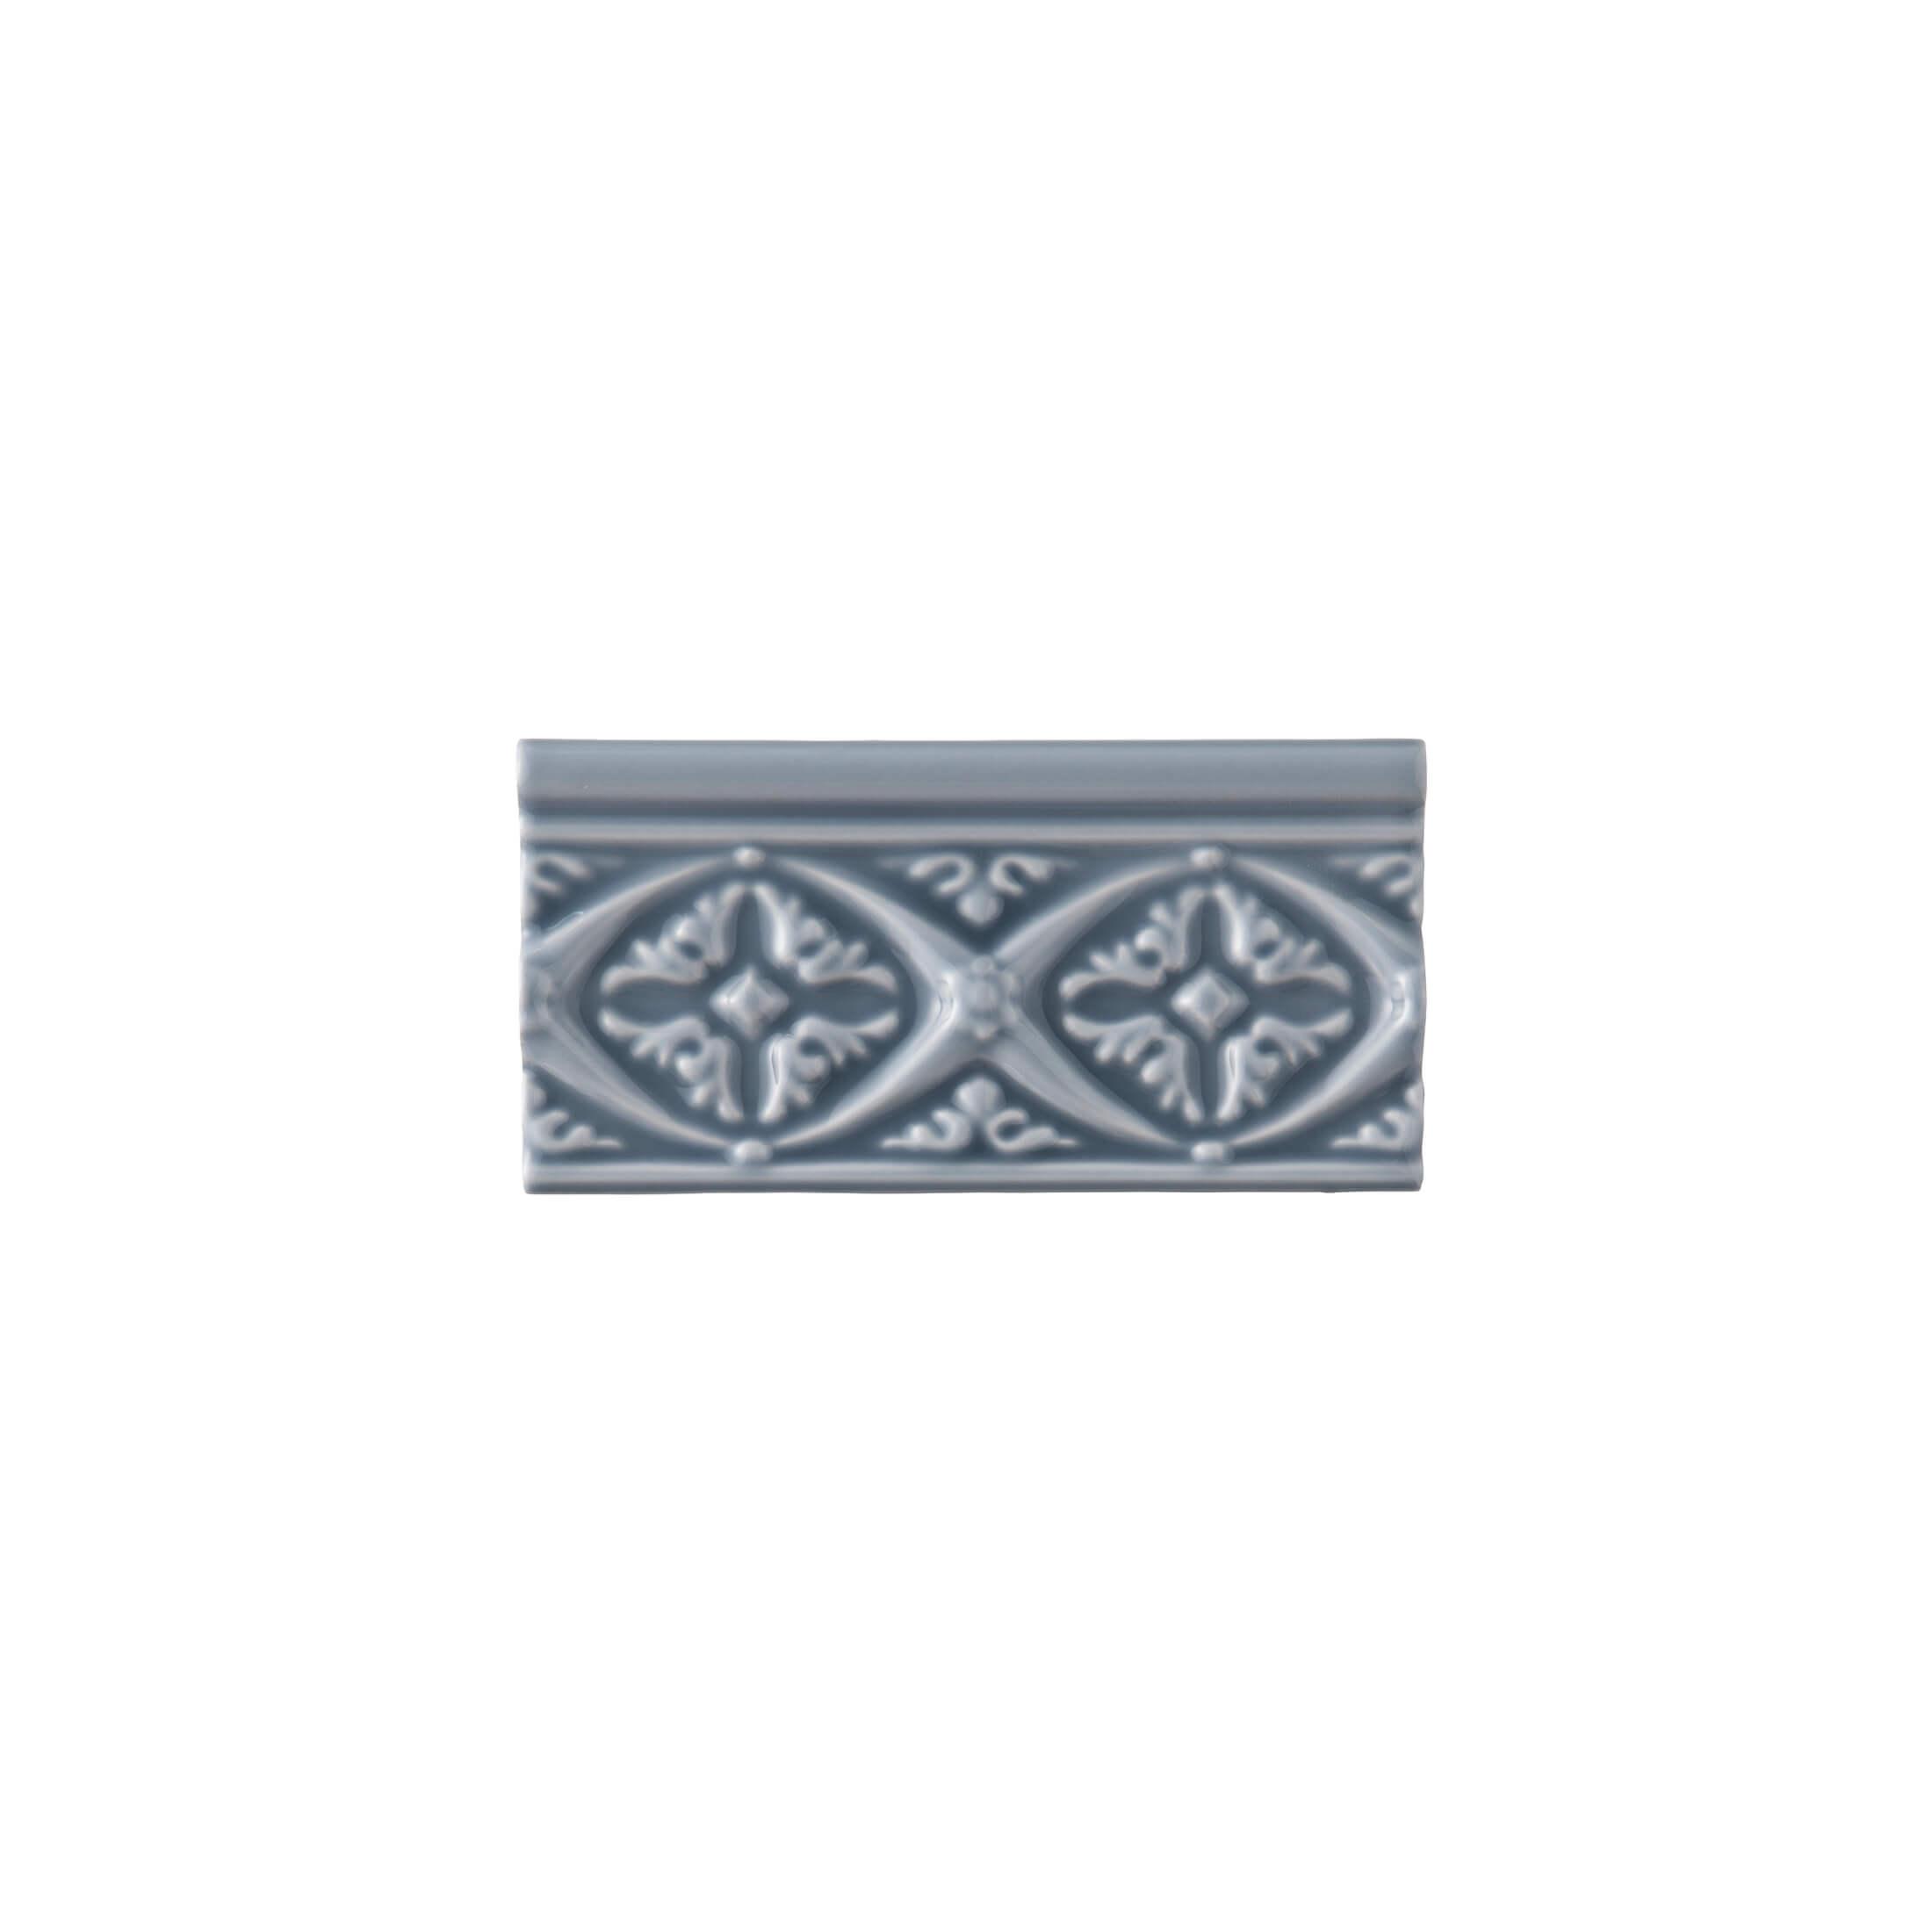 ADNE4142 - RELIEVE BIZANTINO - 7.5 cm X 15 cm